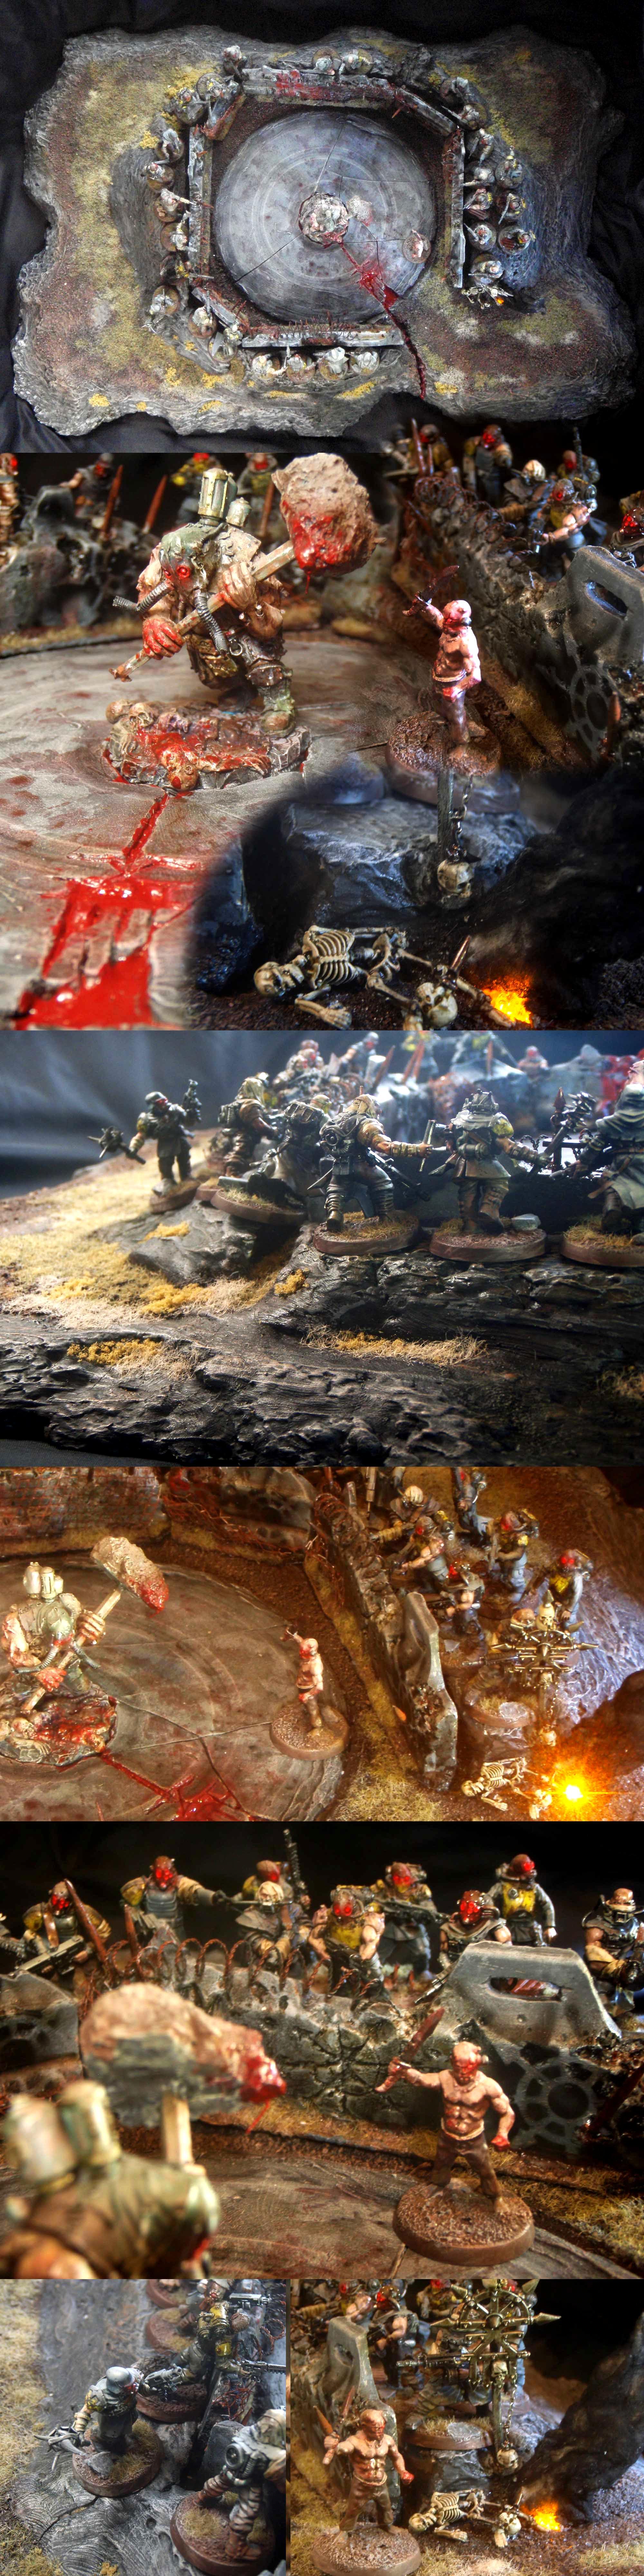 Arena, Blood, Chaos, Cultist, Gladiator, Grimdark, LED, Ogryns